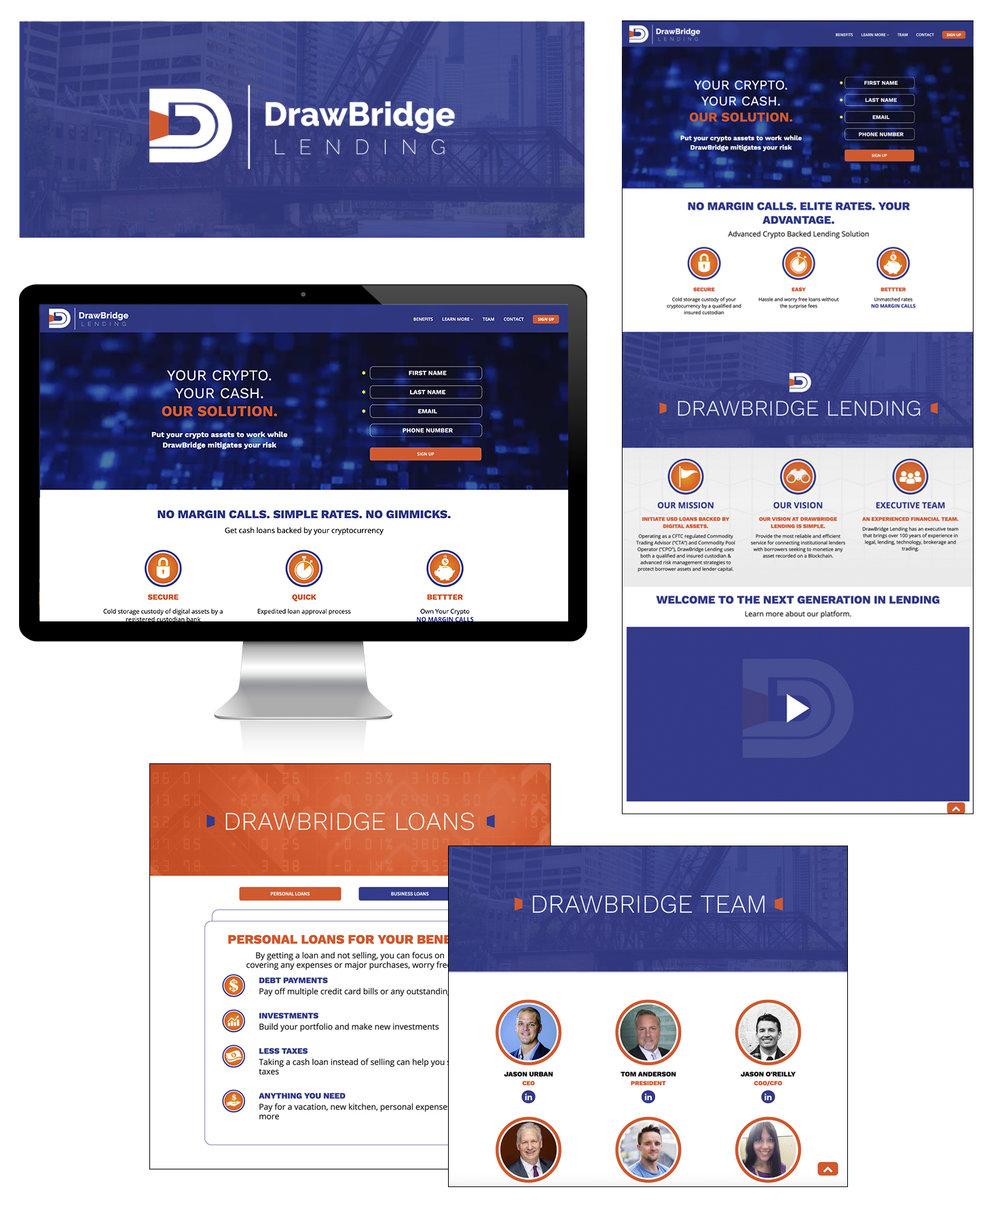 drawbridge-lending-website copy.jpg